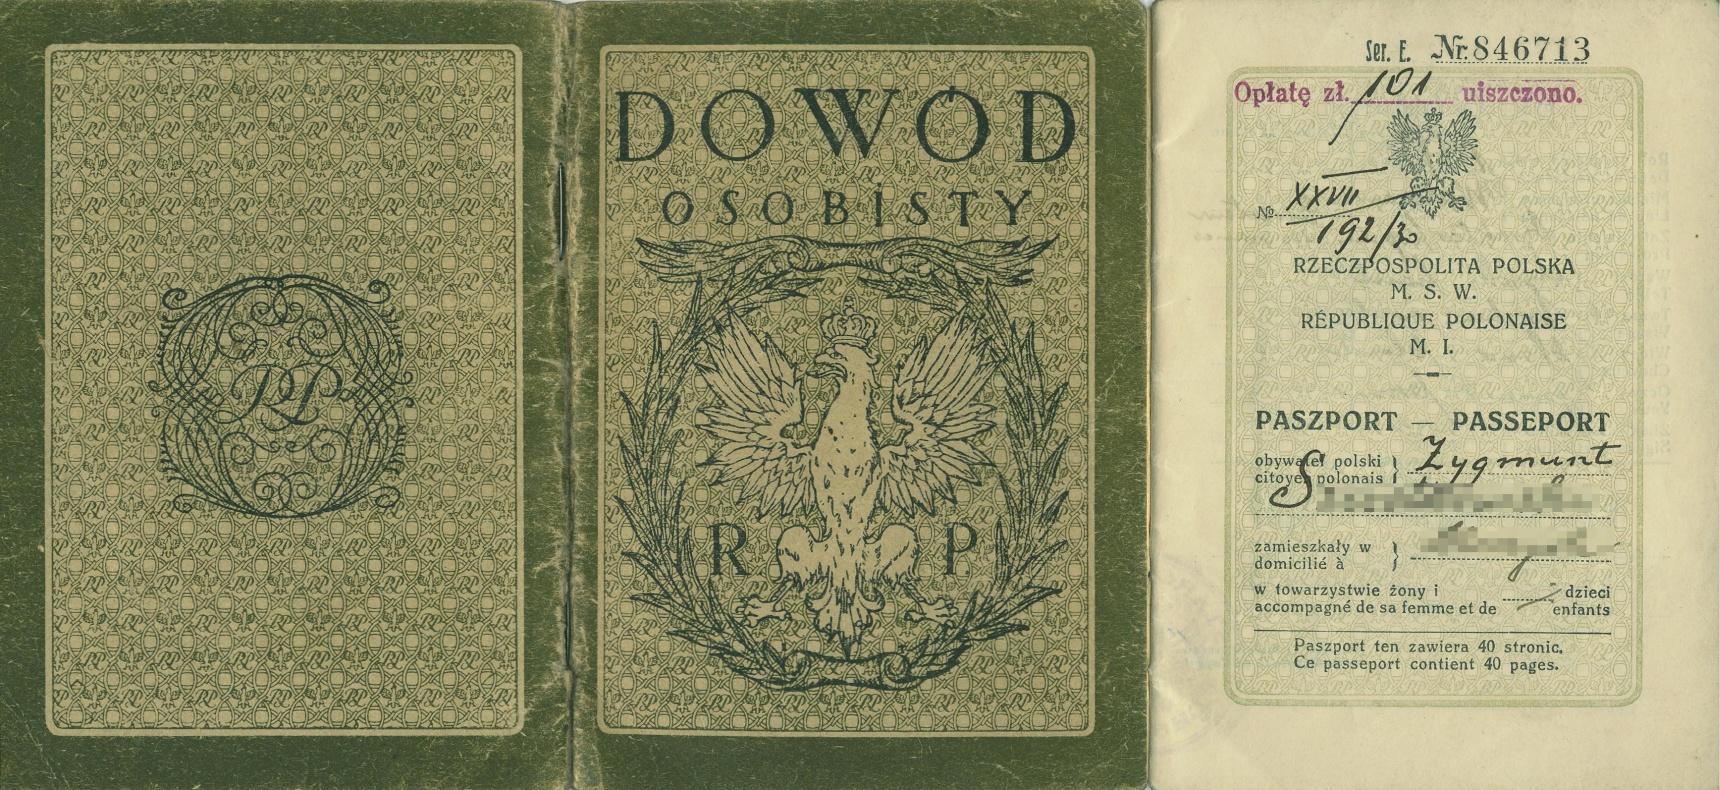 Paszport-dowod1930jpg